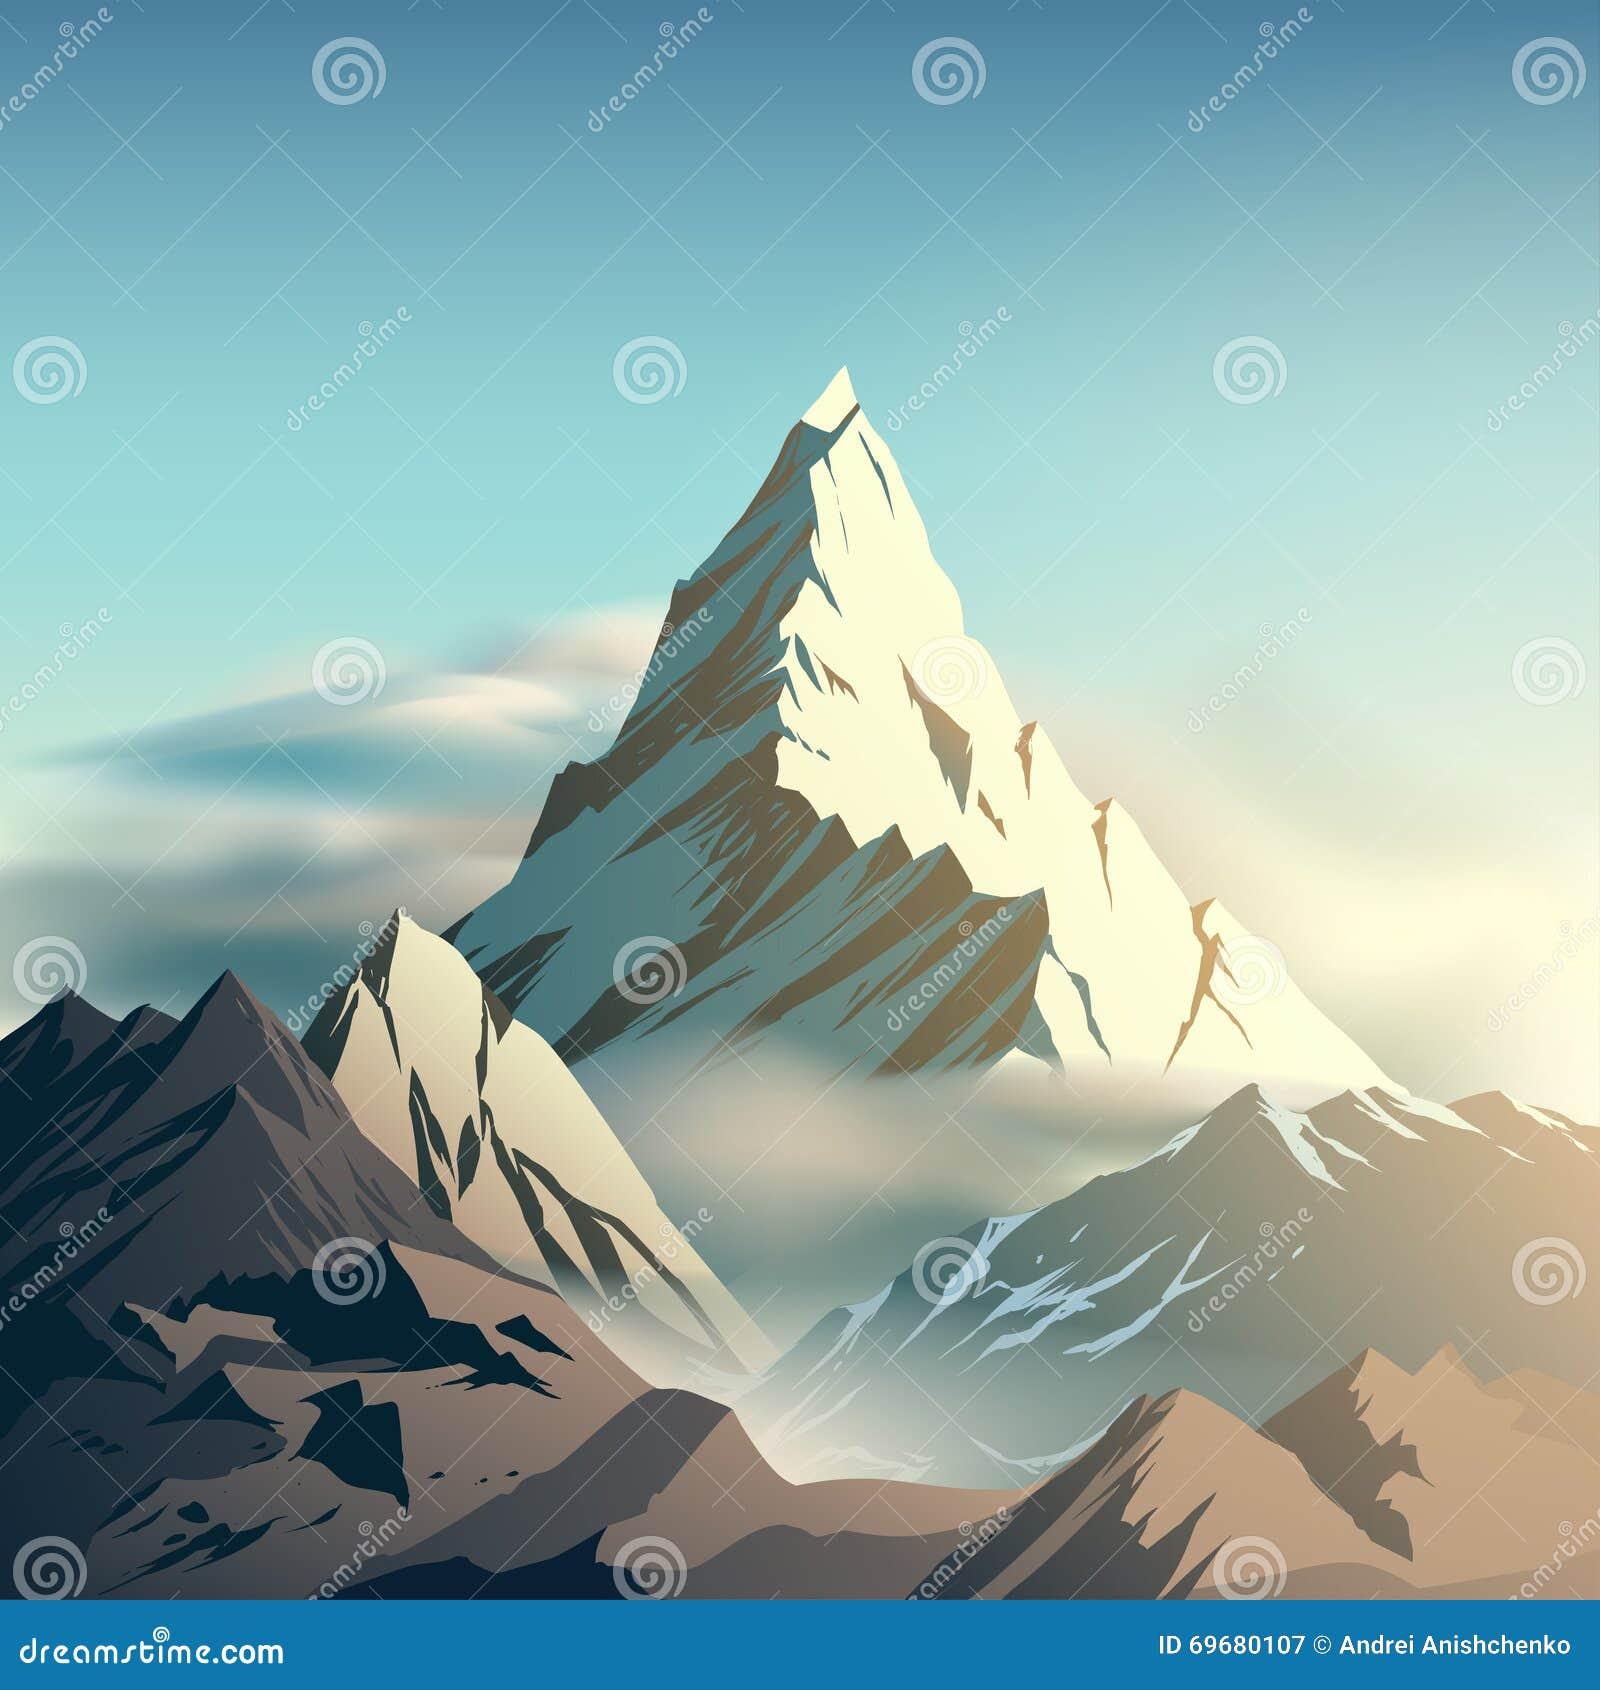 Stock Illustration Mountain Illustration Clouds Vector Image69680107